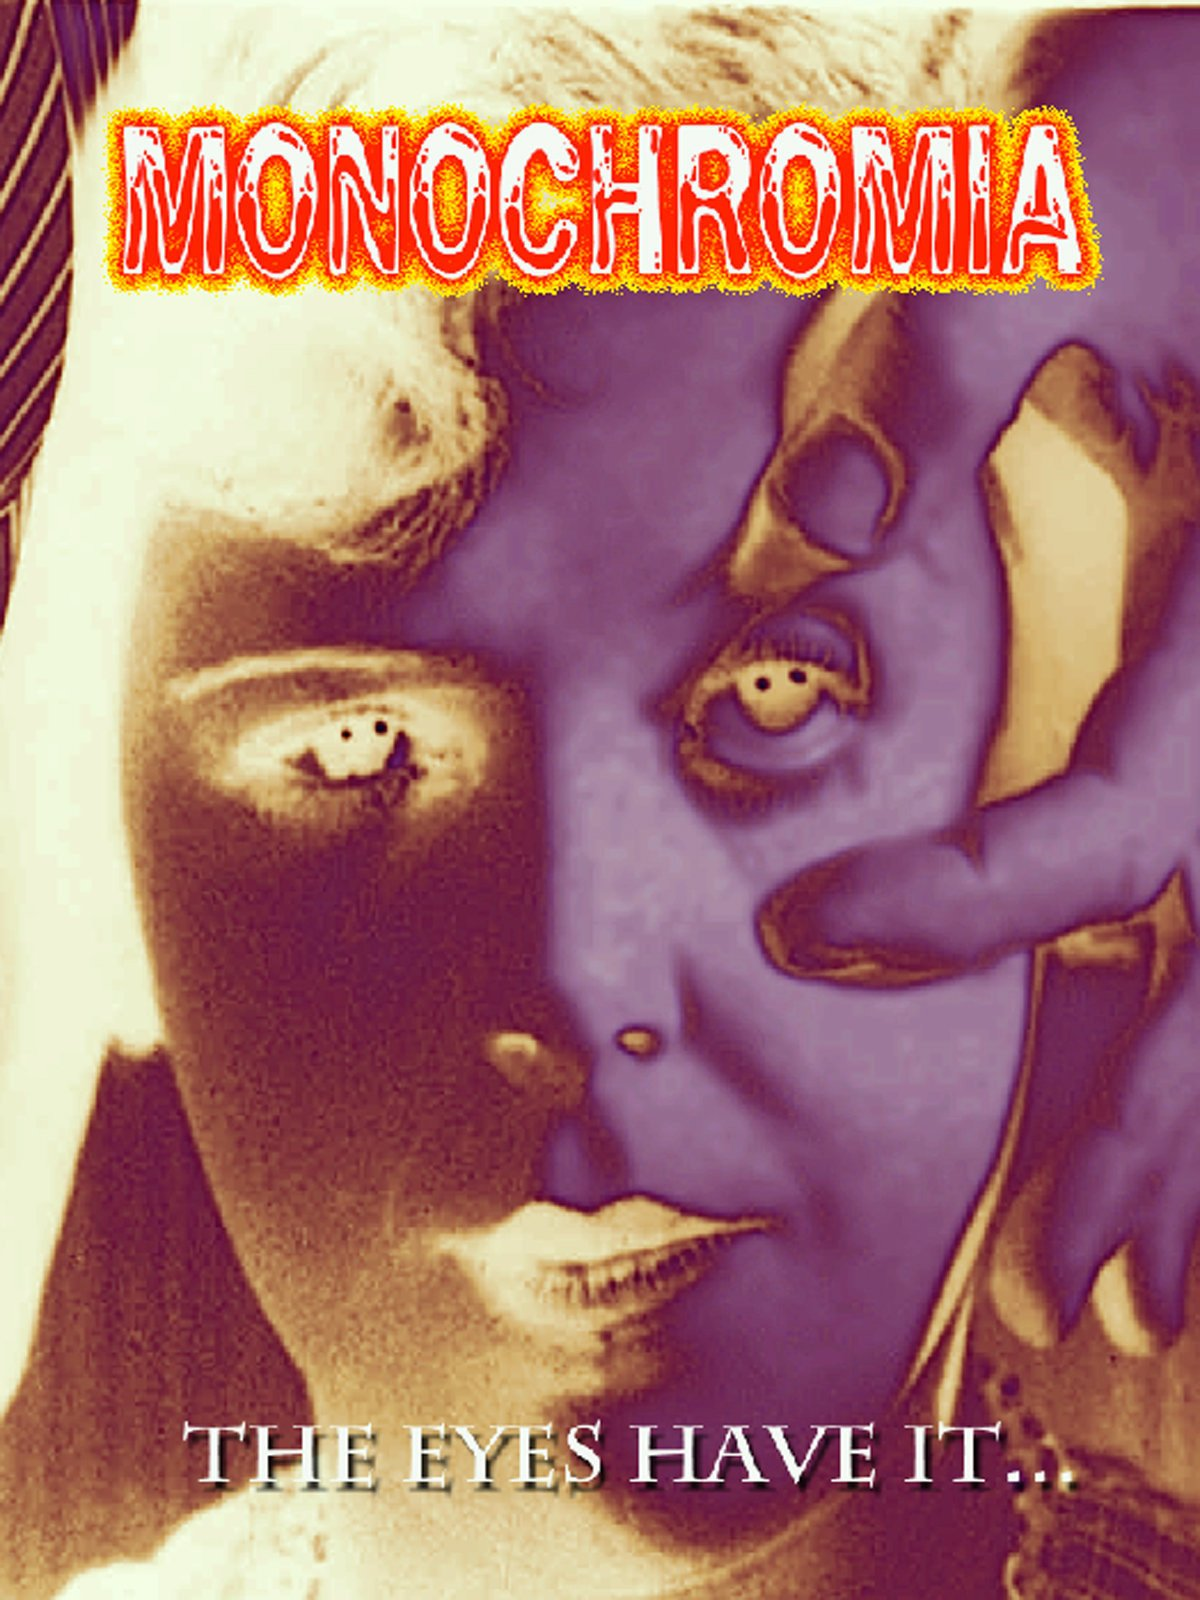 Monochromia